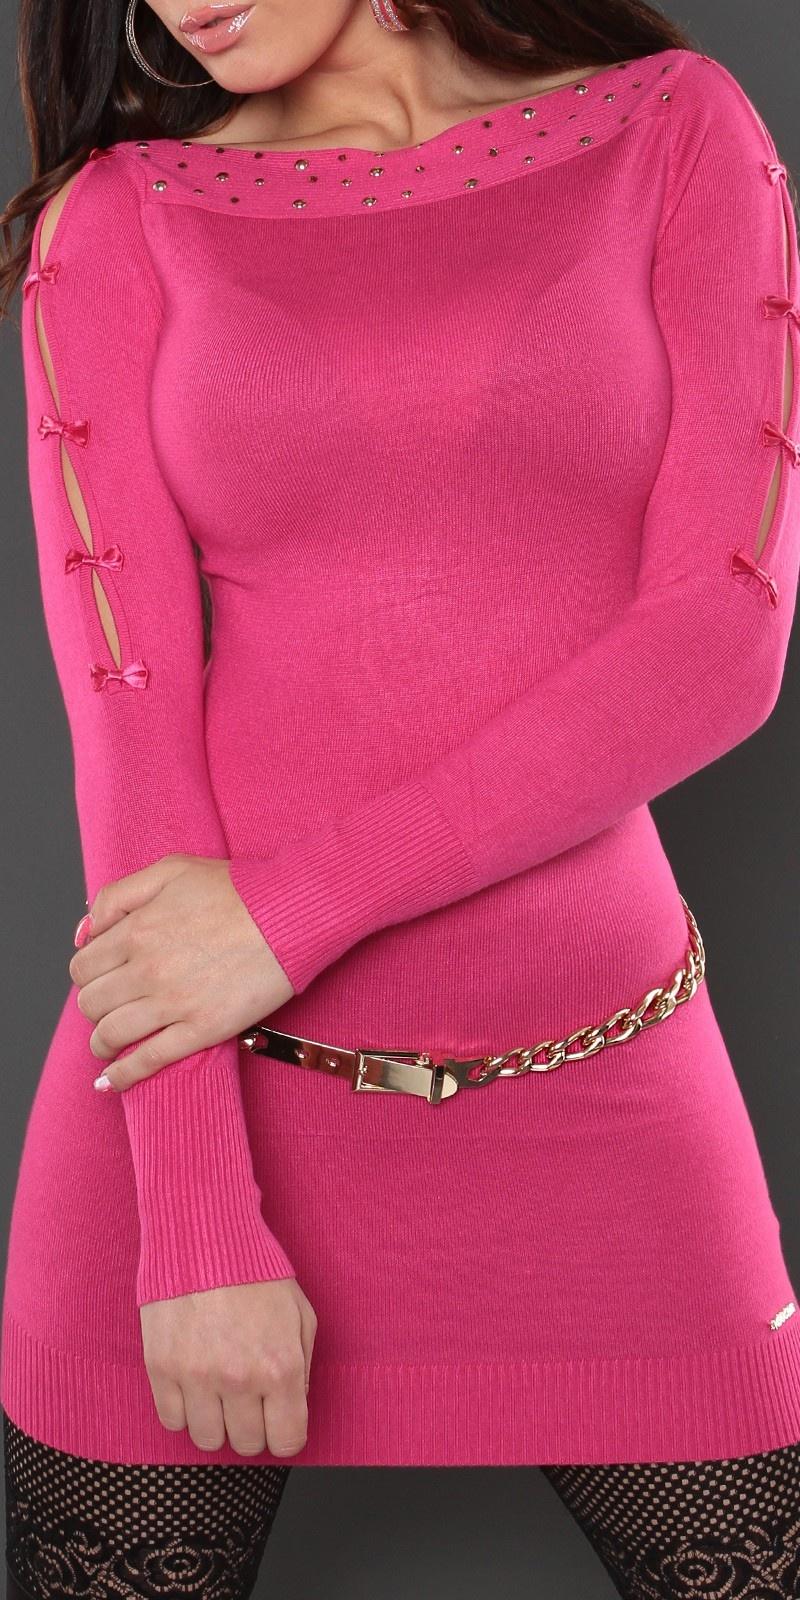 Sexy lange sweater-trui met strikjes fuchsiaroze